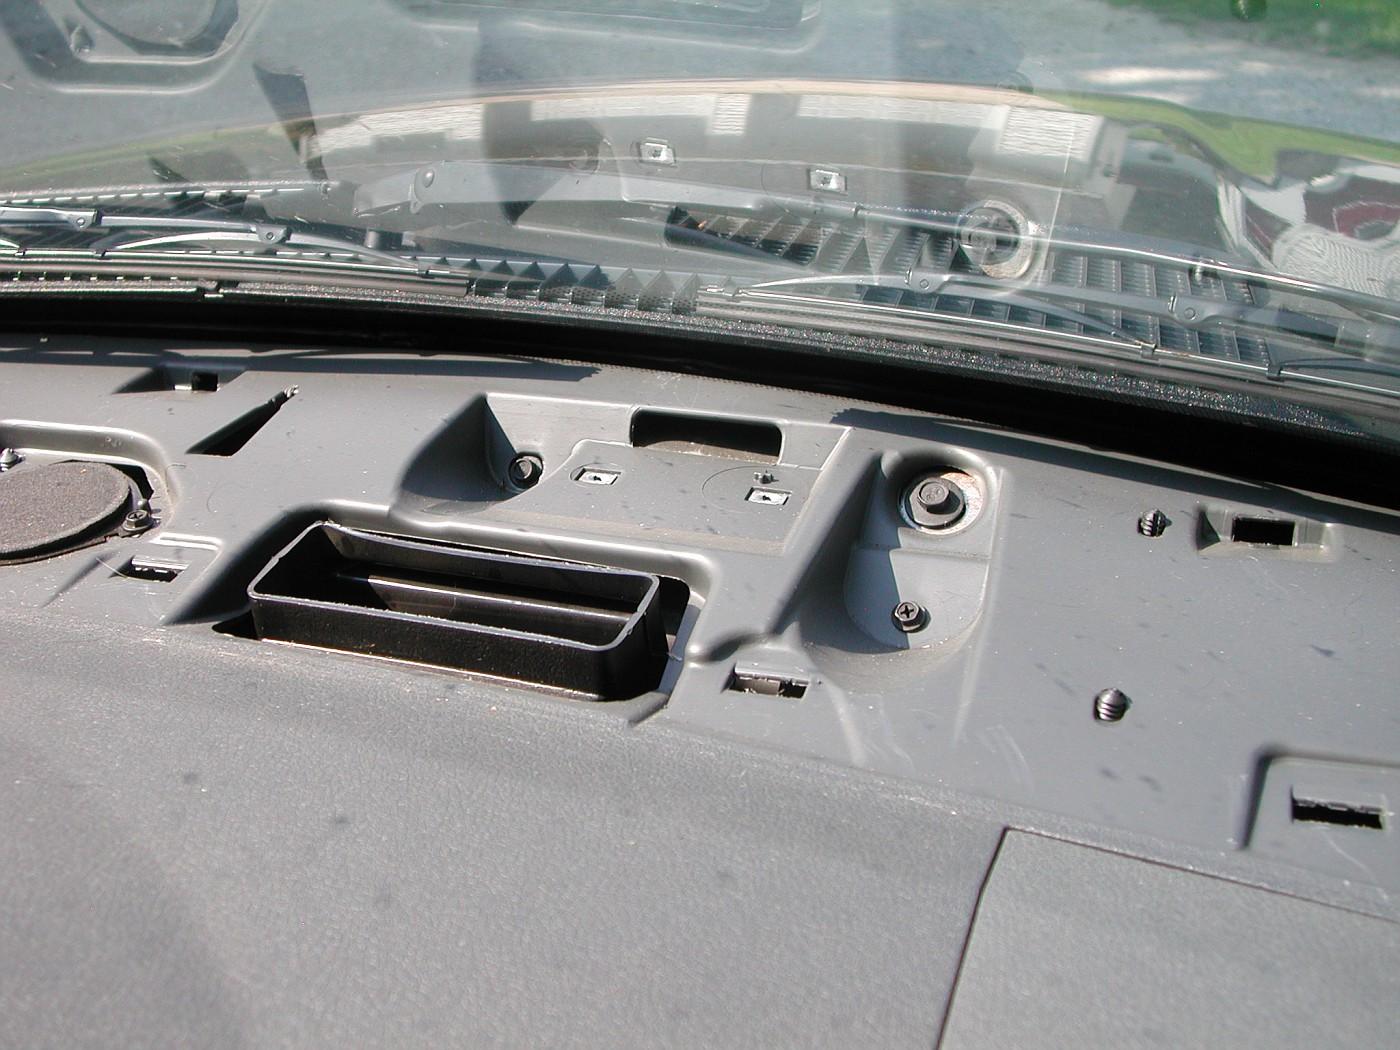 2007 Ram Navigation Radio Rec Installation Pics 2012 Dodge Antenna Diagram This Is The Spot On Dash Where Gps Mounts